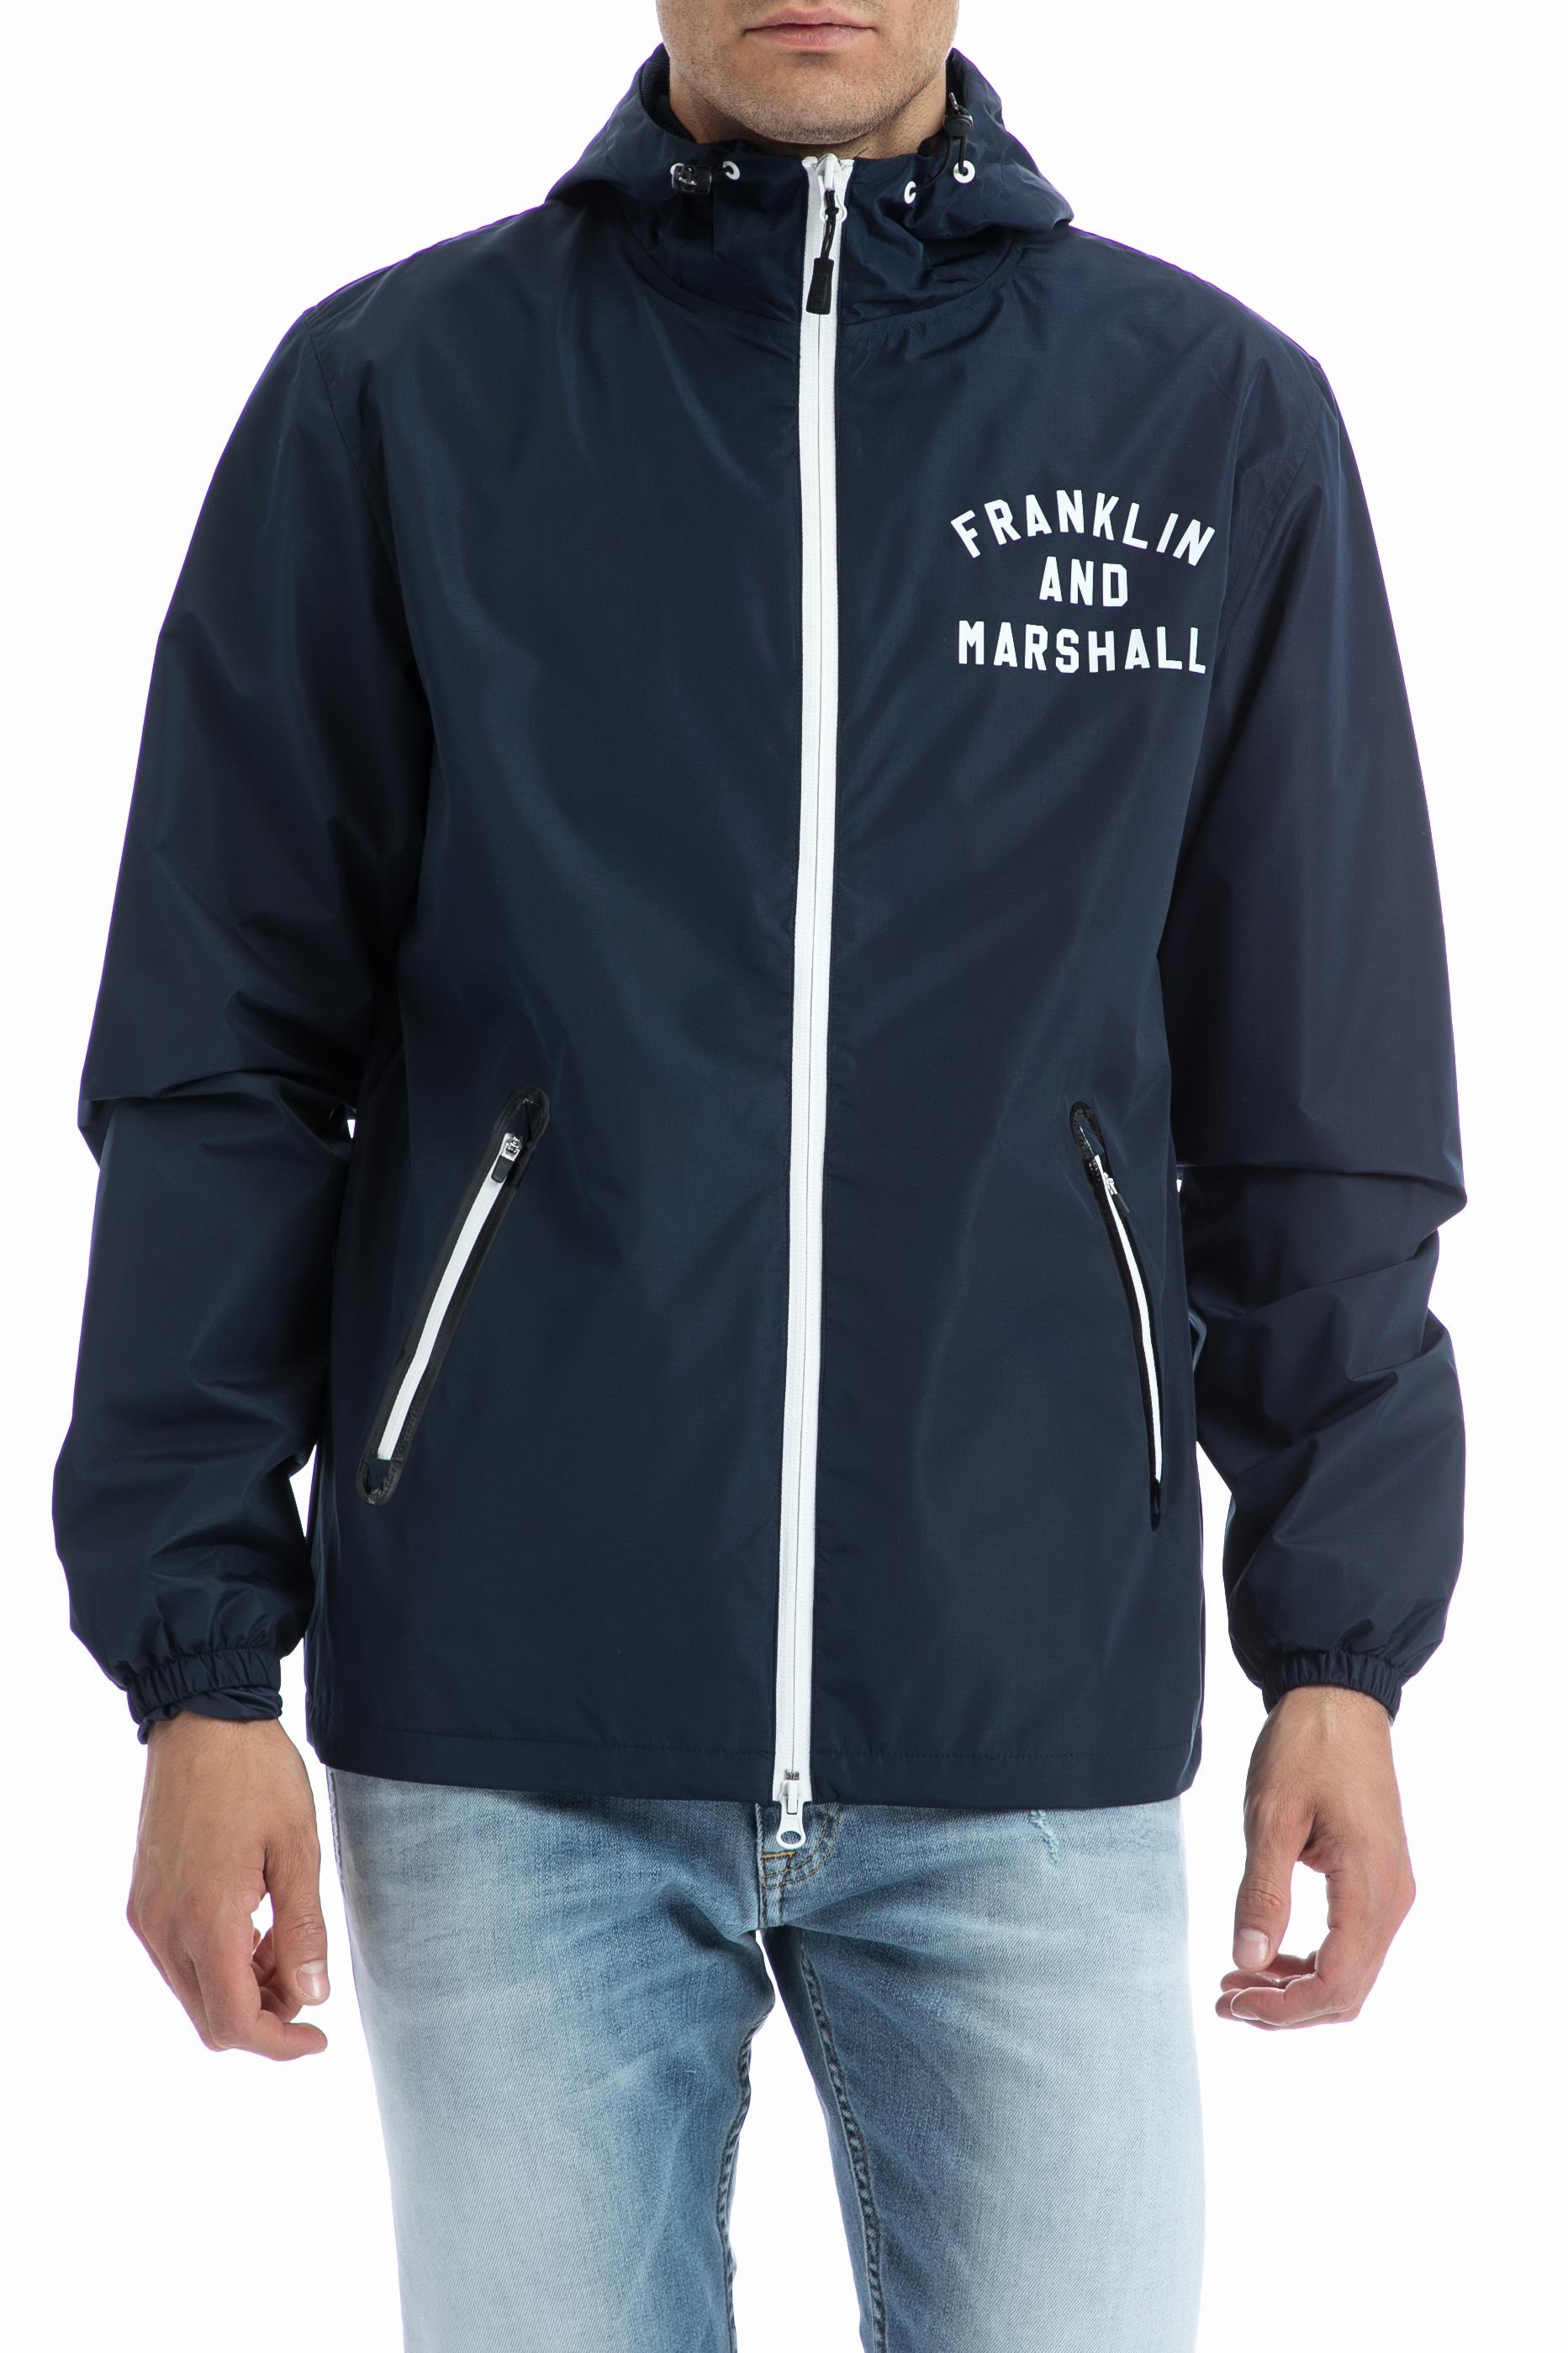 FRANKLIN & MARSHALL – Ανδρικό τζάκετ Franklin & Marshall μπλε